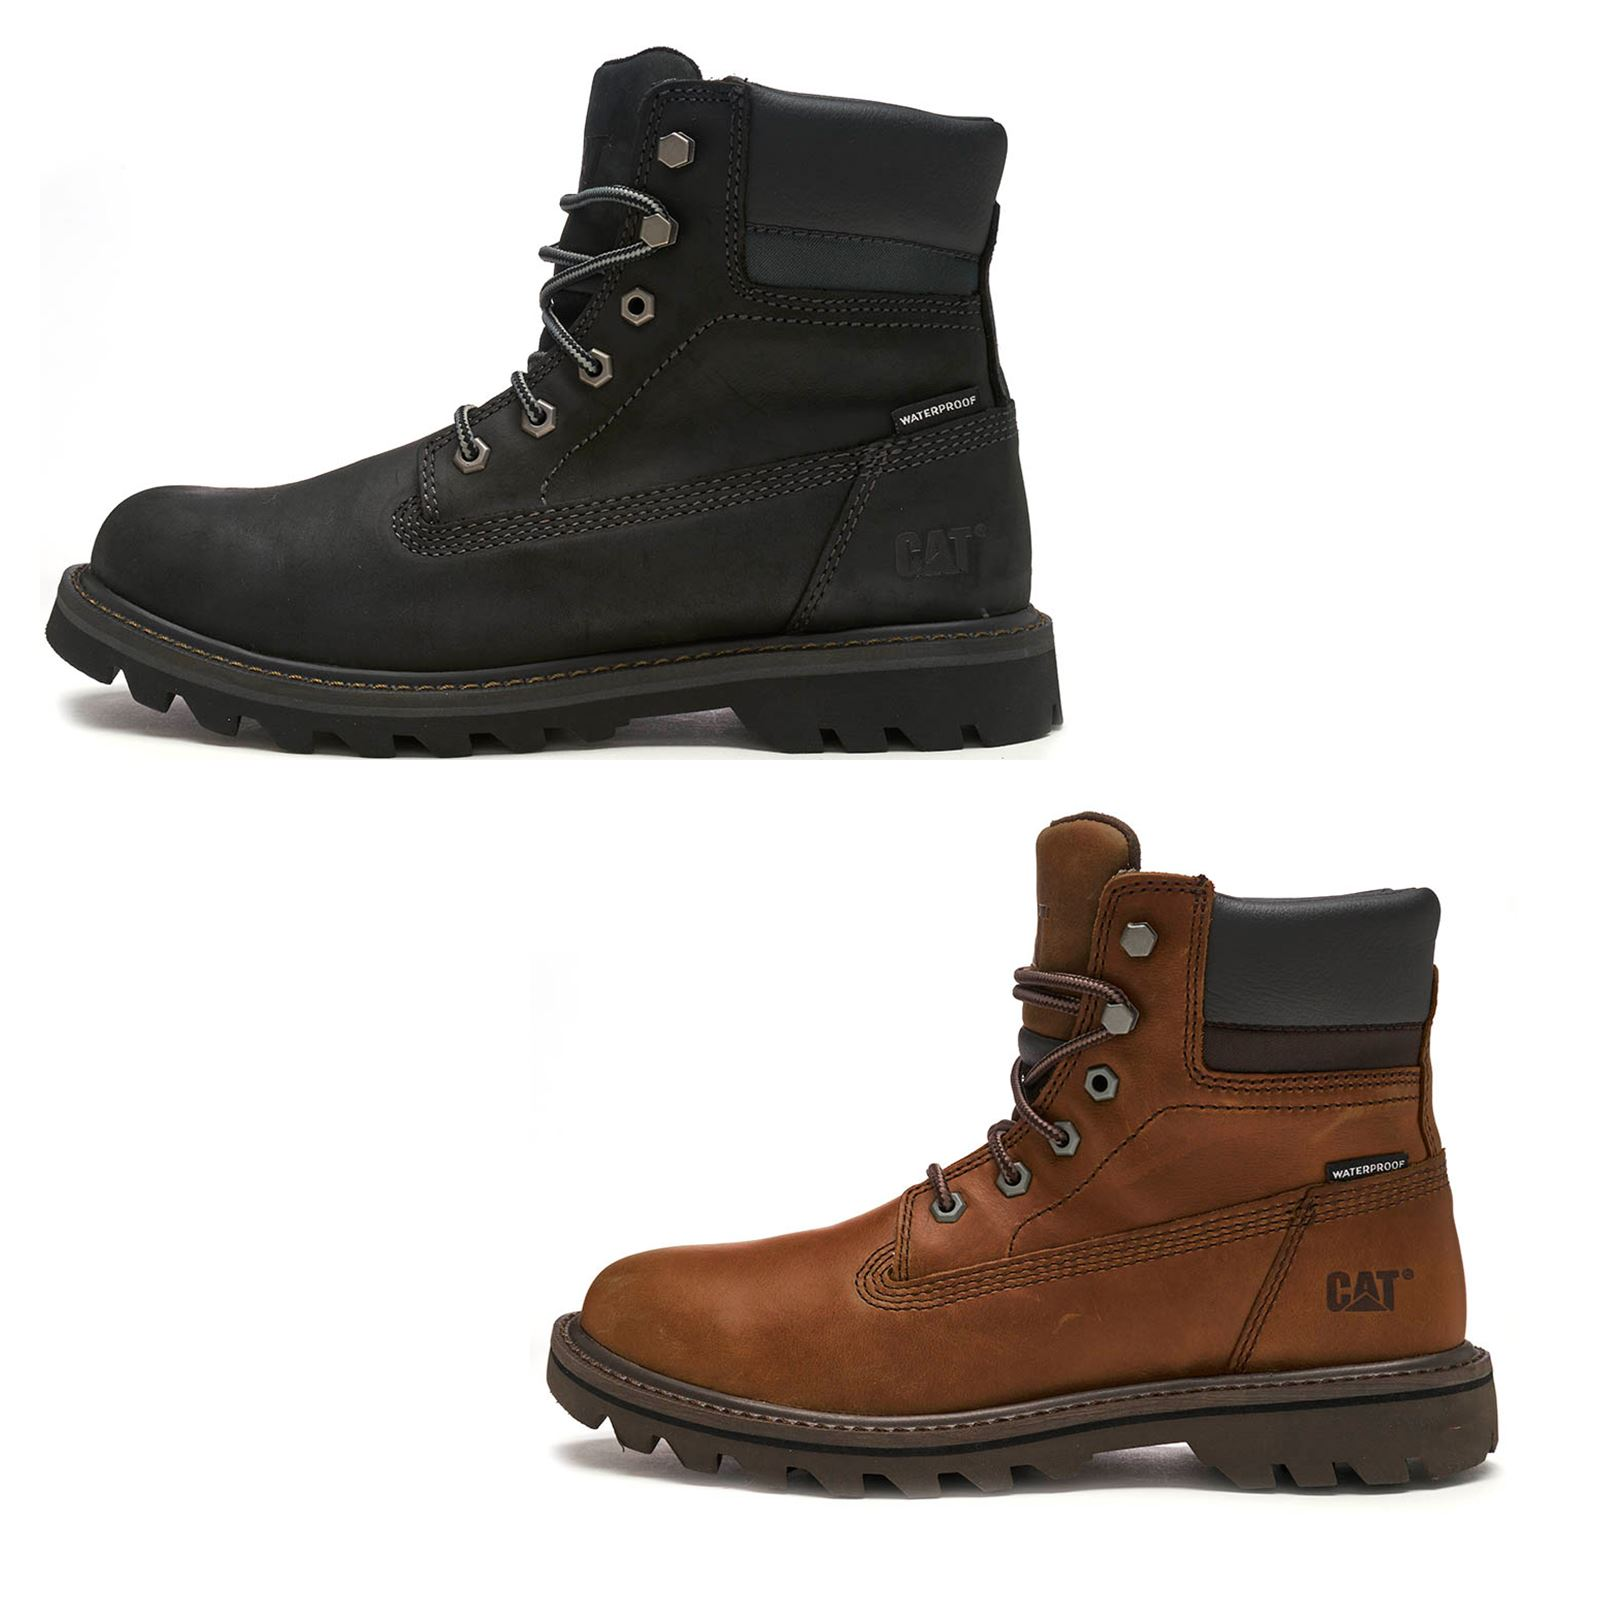 234a3b51925 Caterpillar CAT Deplete Waterproof Boots in Black   Brown